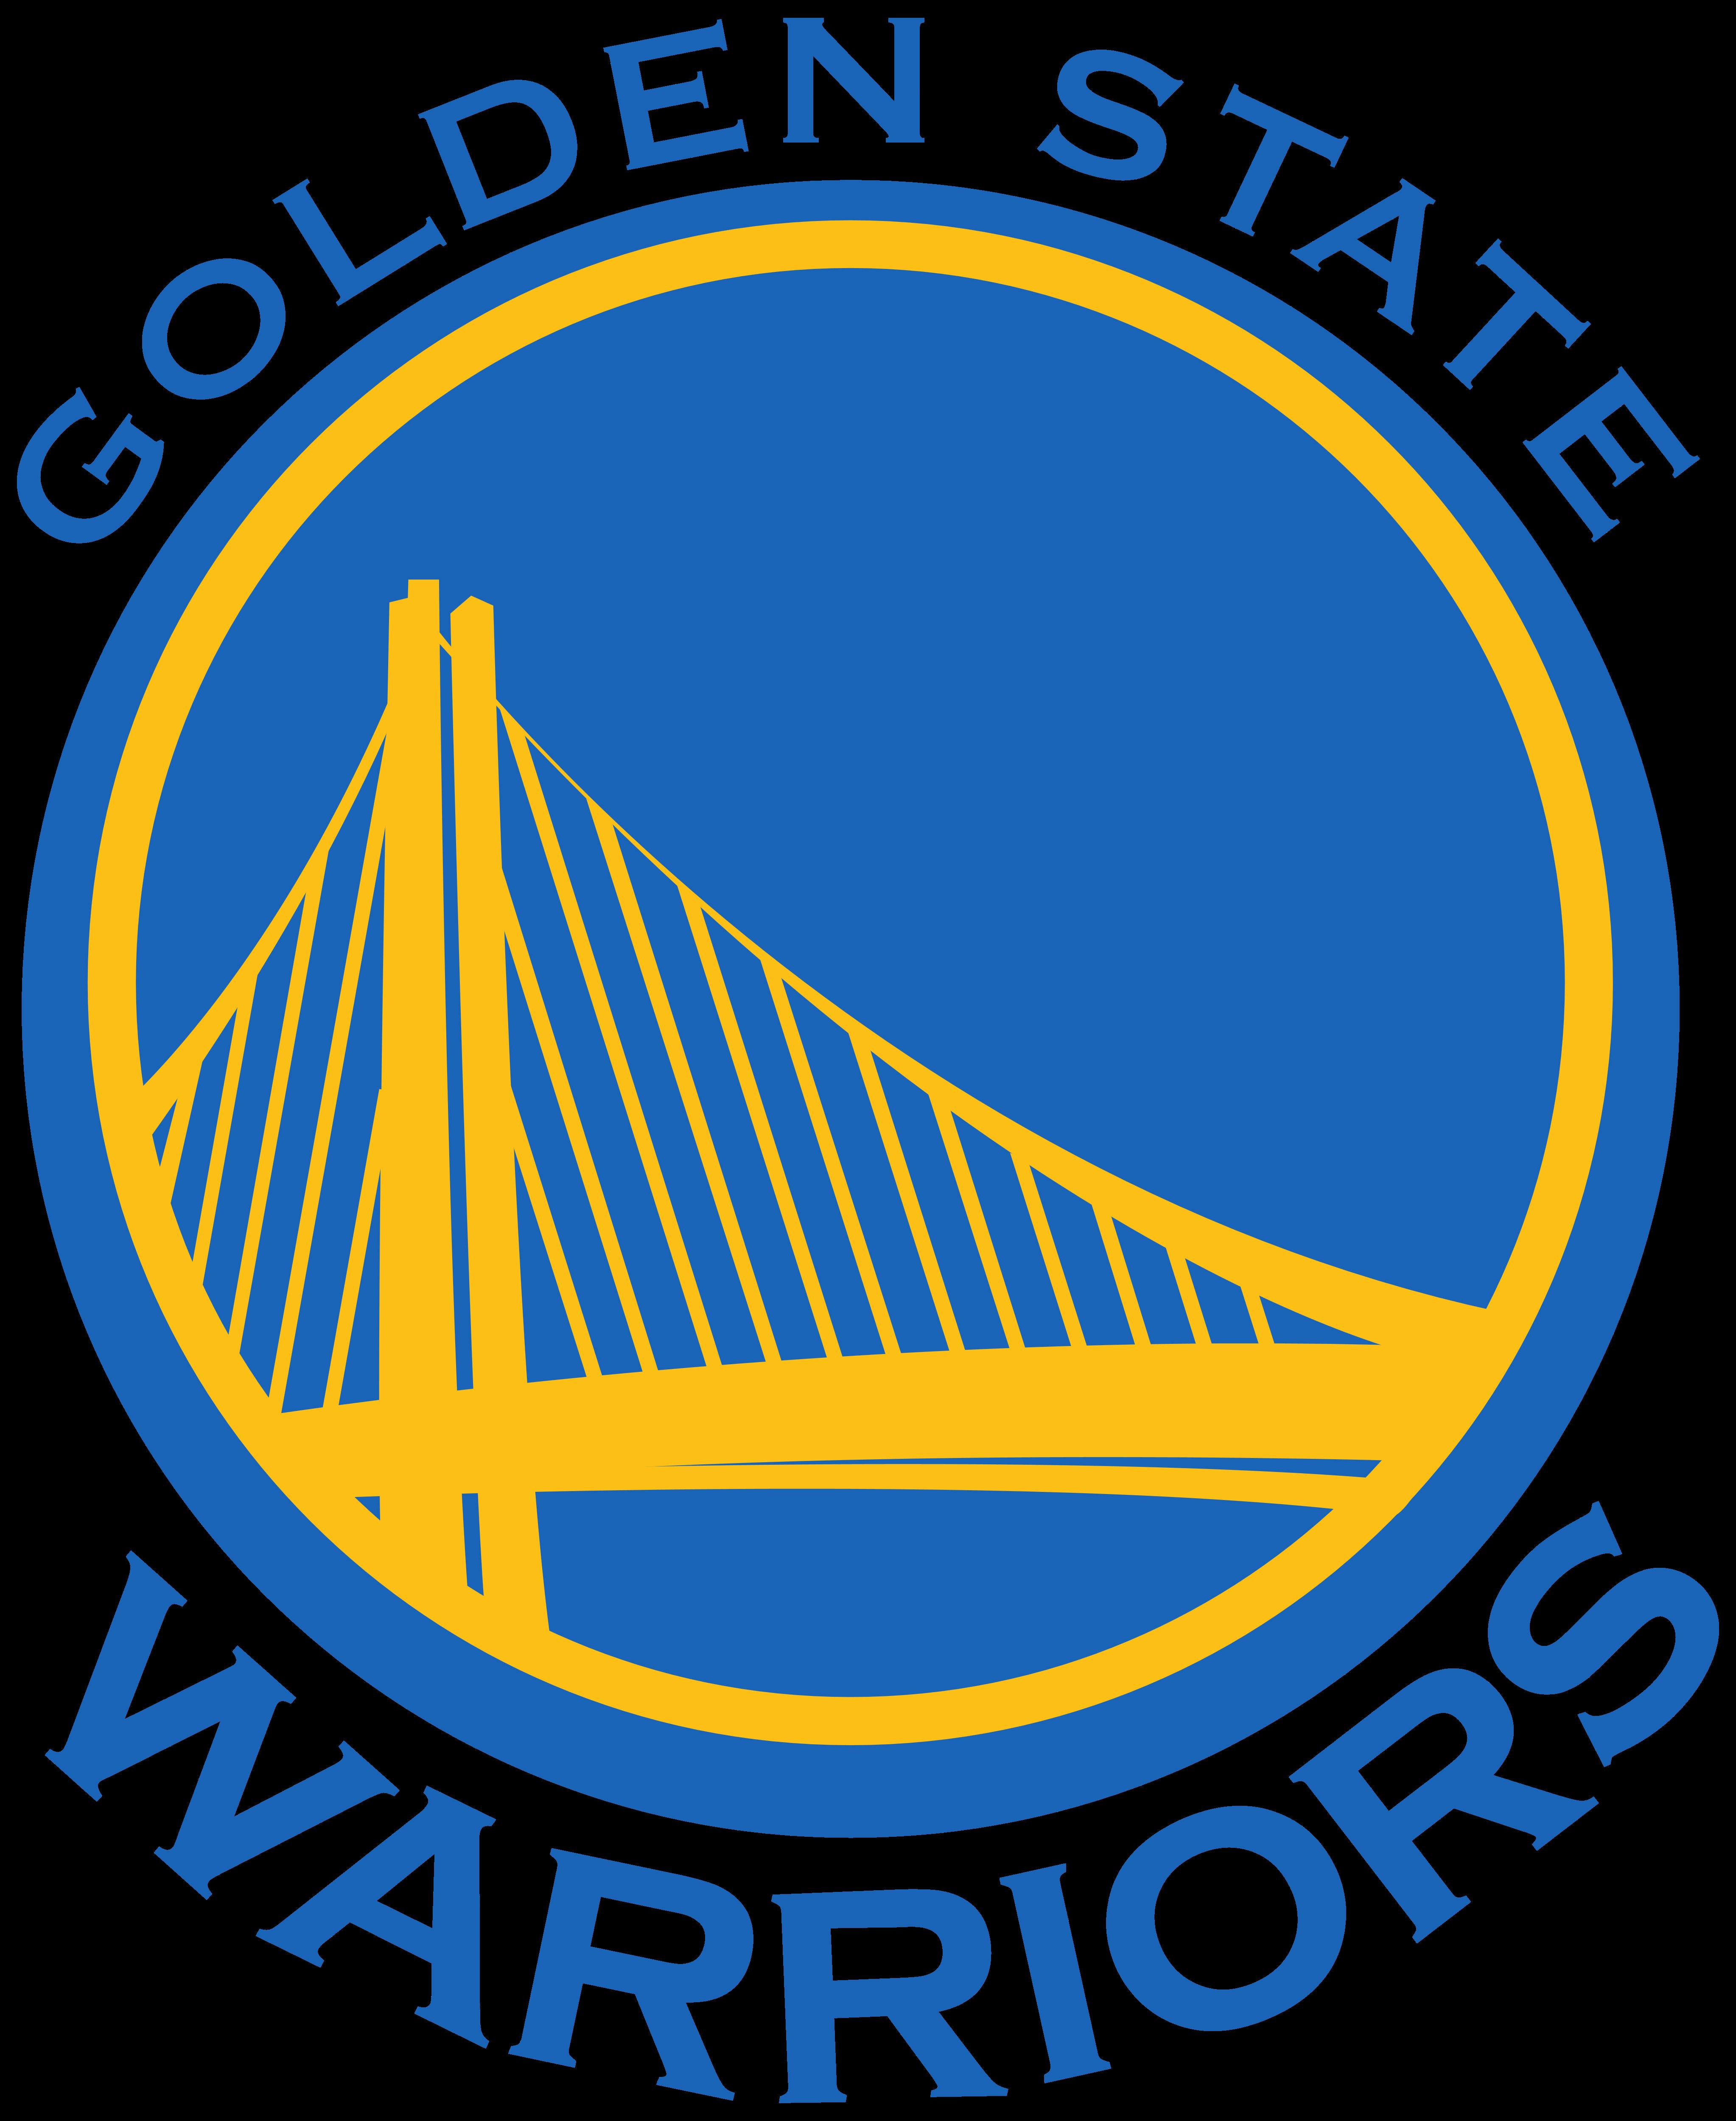 Golden State Warriors - Logos Download